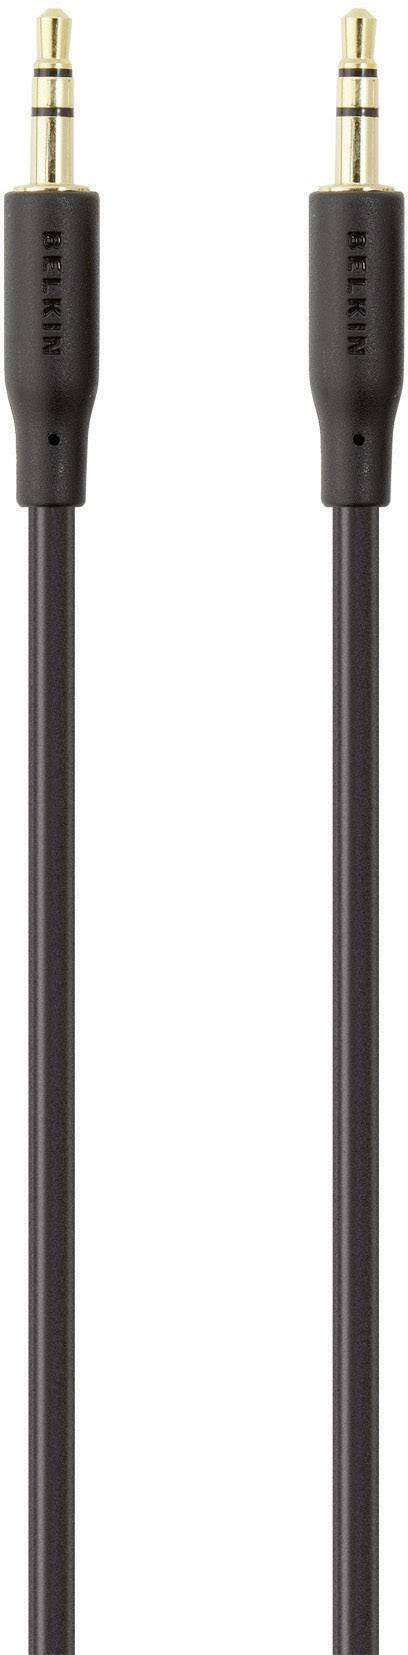 Jack audio prepojovací kábel Belkin F3Y117bt1M, 1 m, čierna